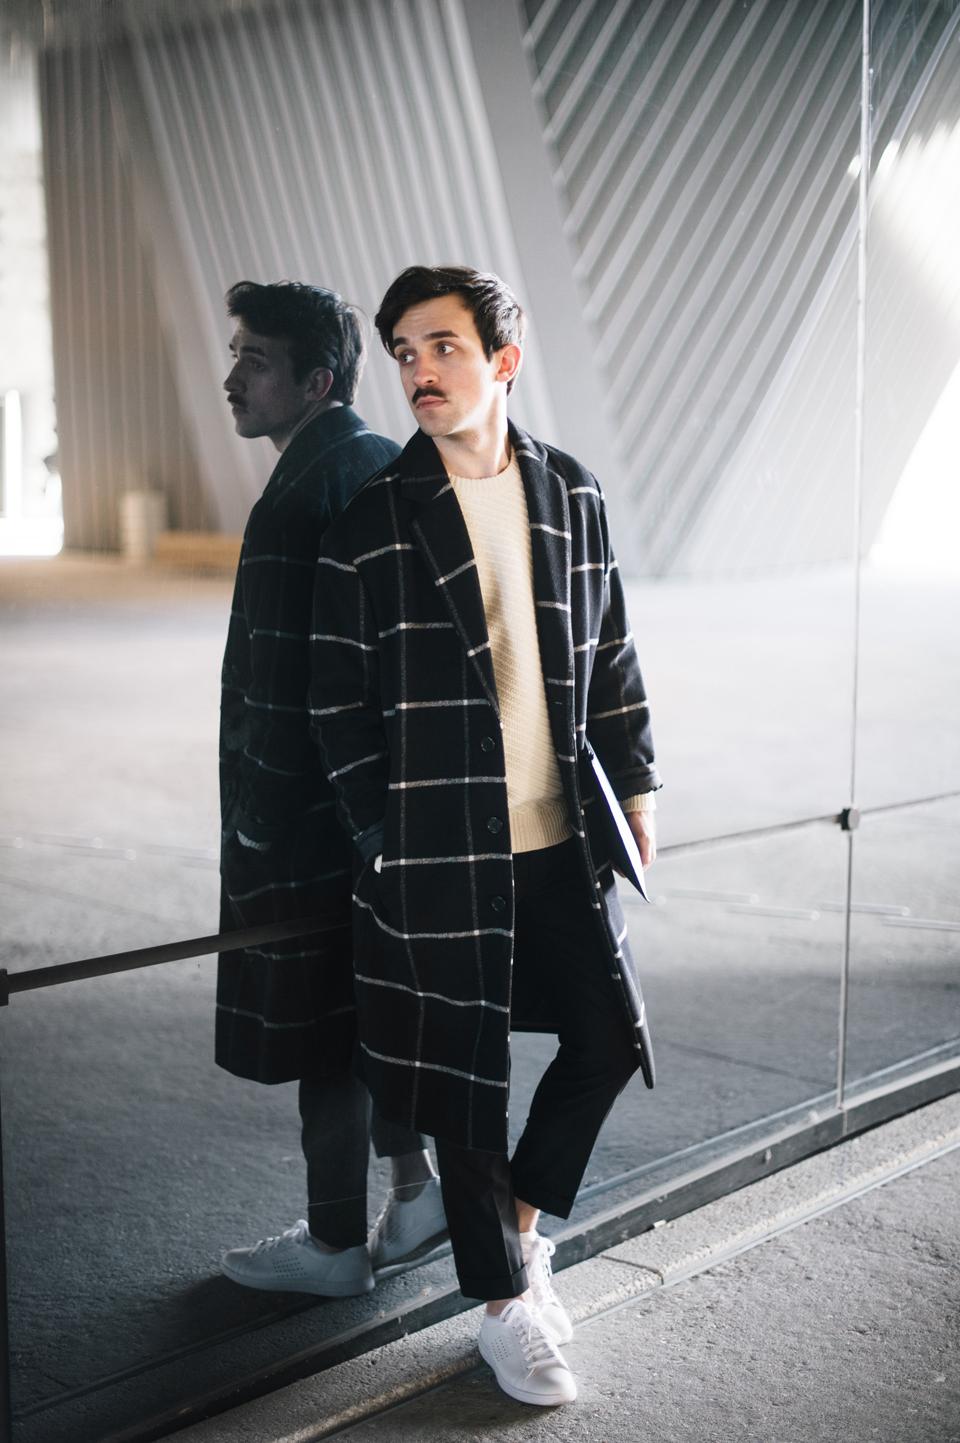 manteau laine homme on pinterest manteau hiver homme. Black Bedroom Furniture Sets. Home Design Ideas